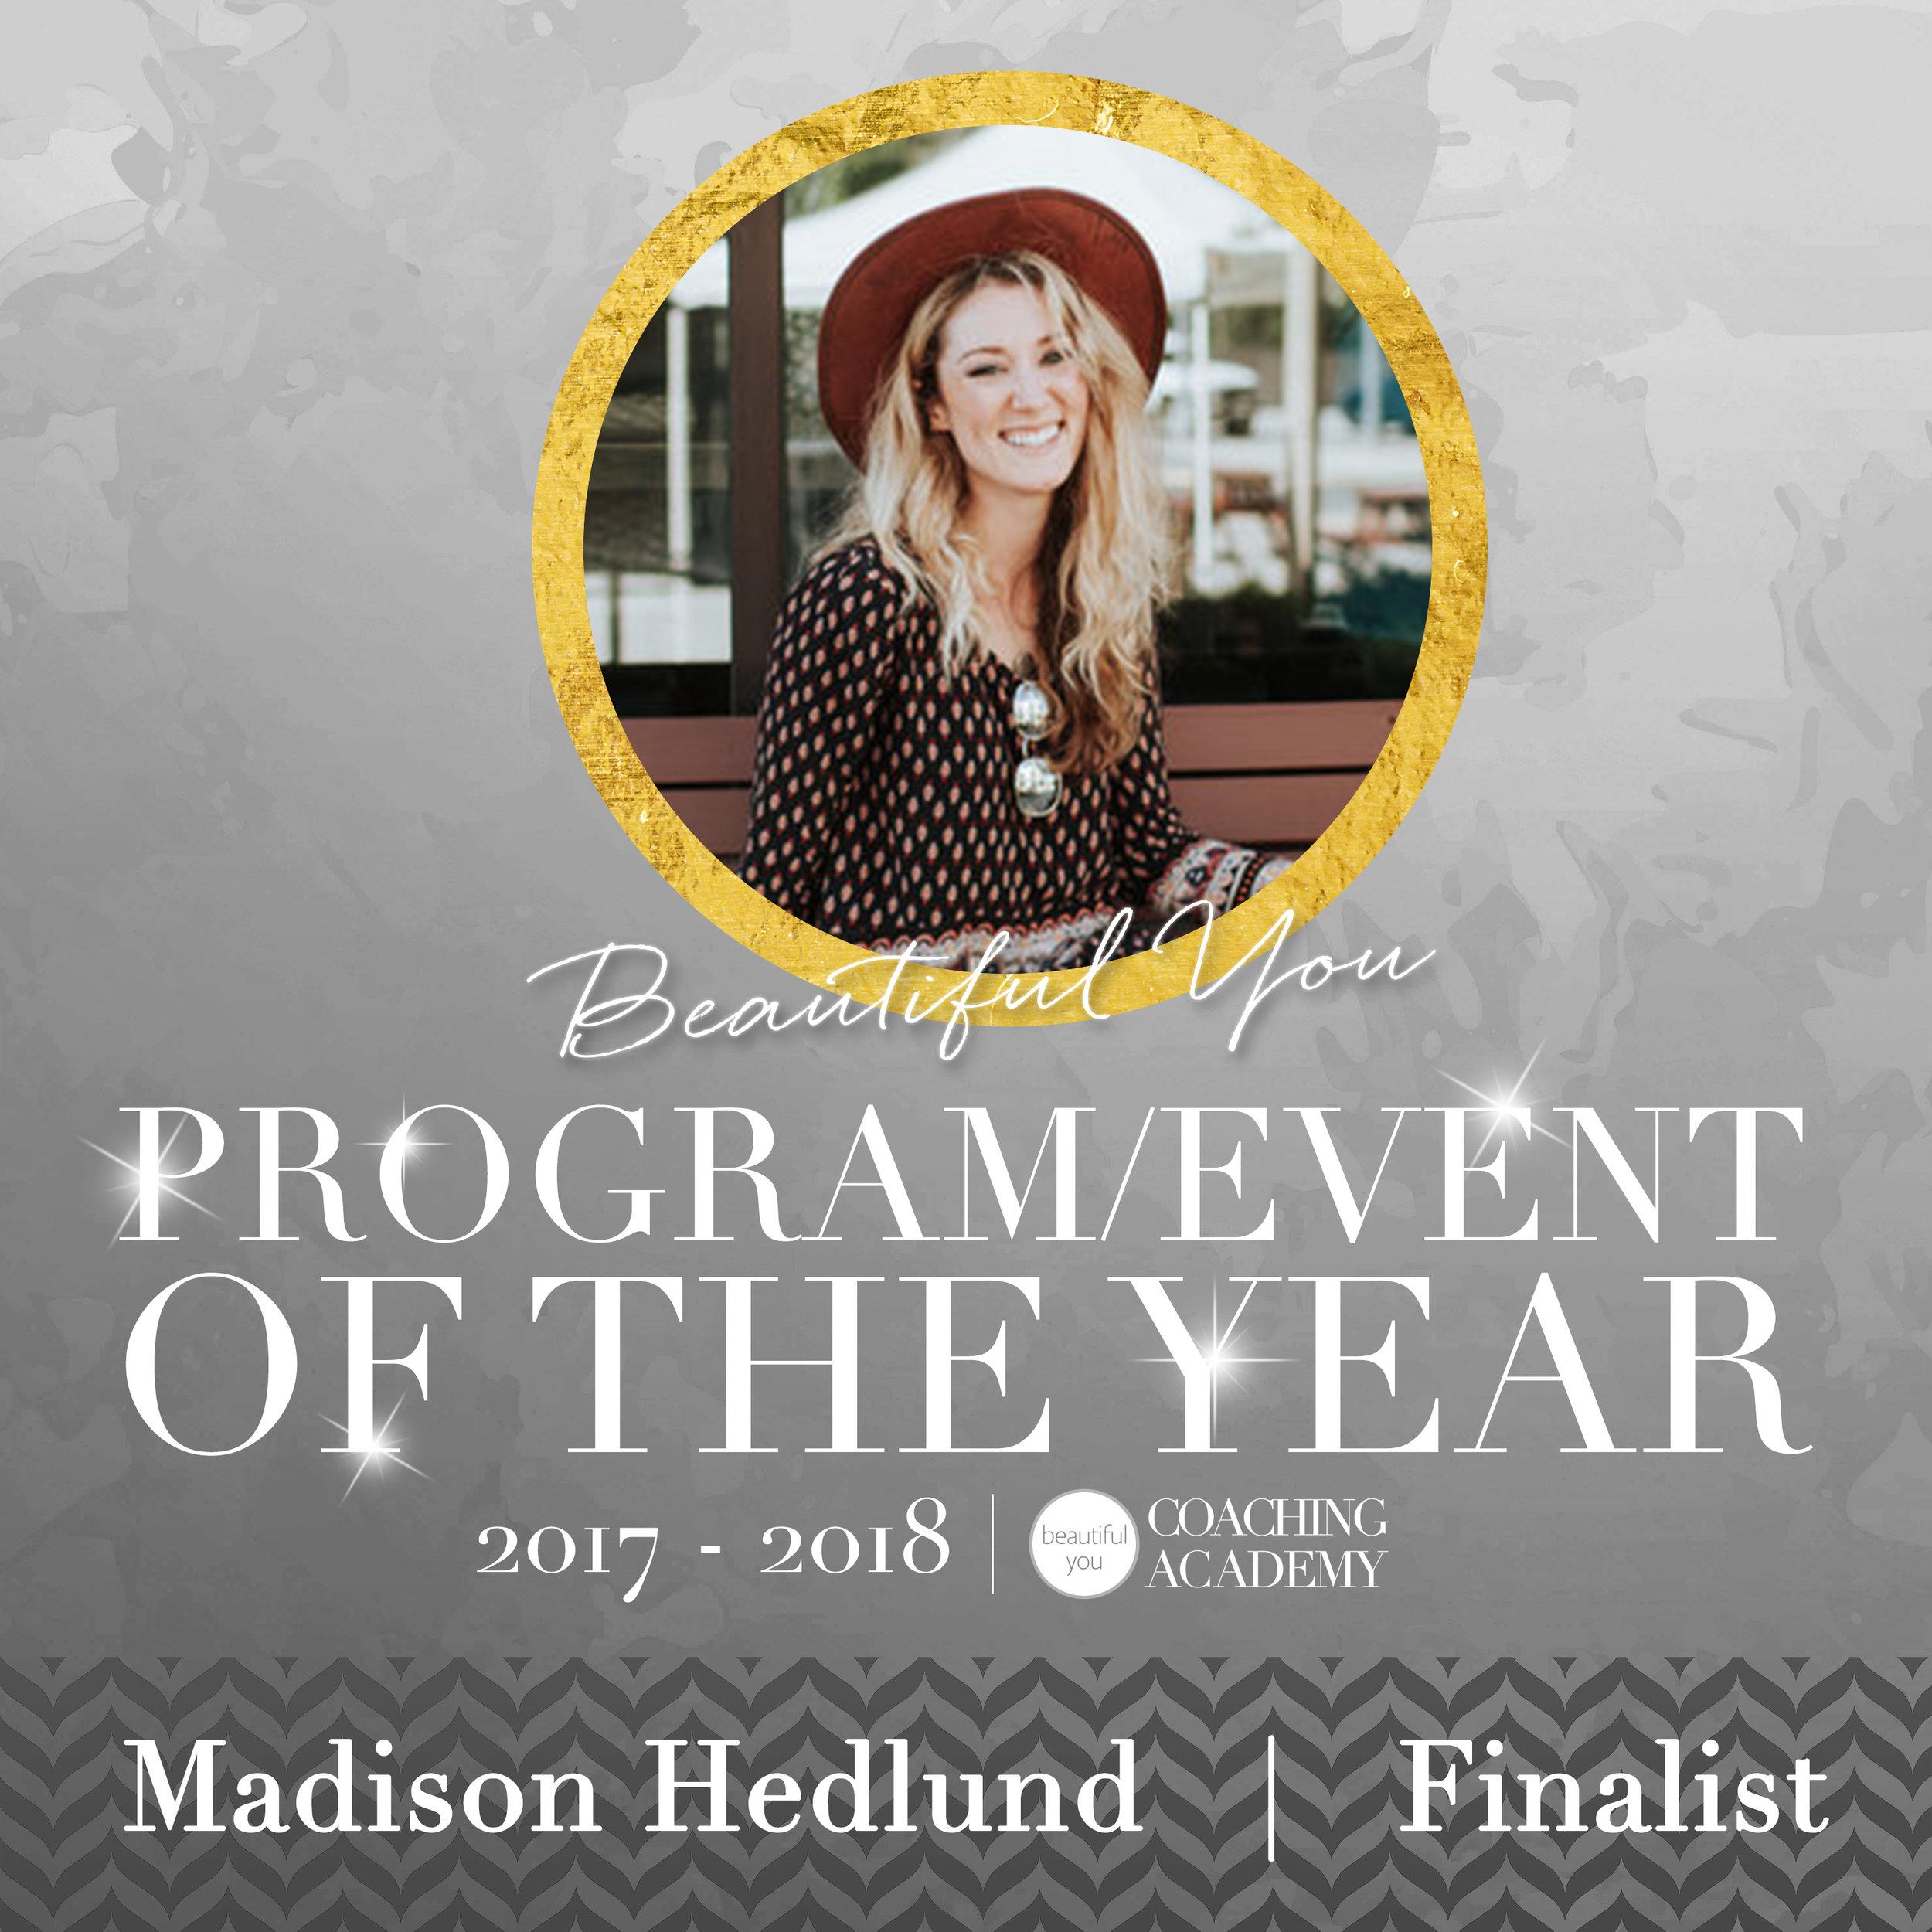 ProgramAward_Madison-Hedlund.jpg